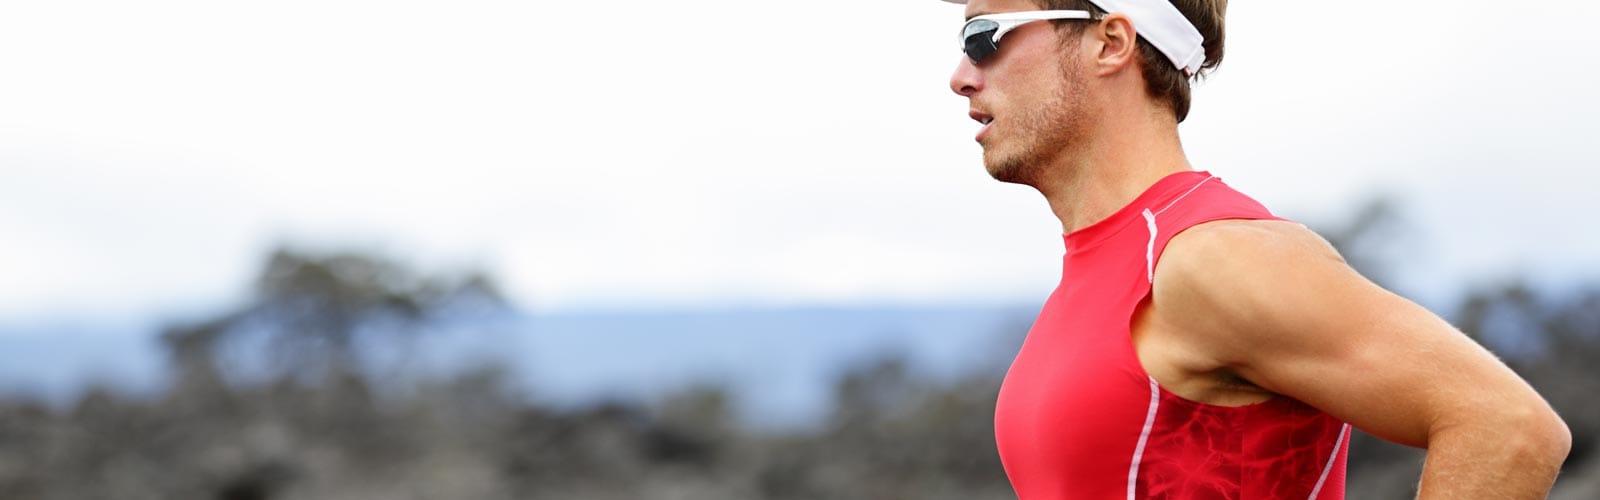 triathlon sunglasses  triathlon sunglasses